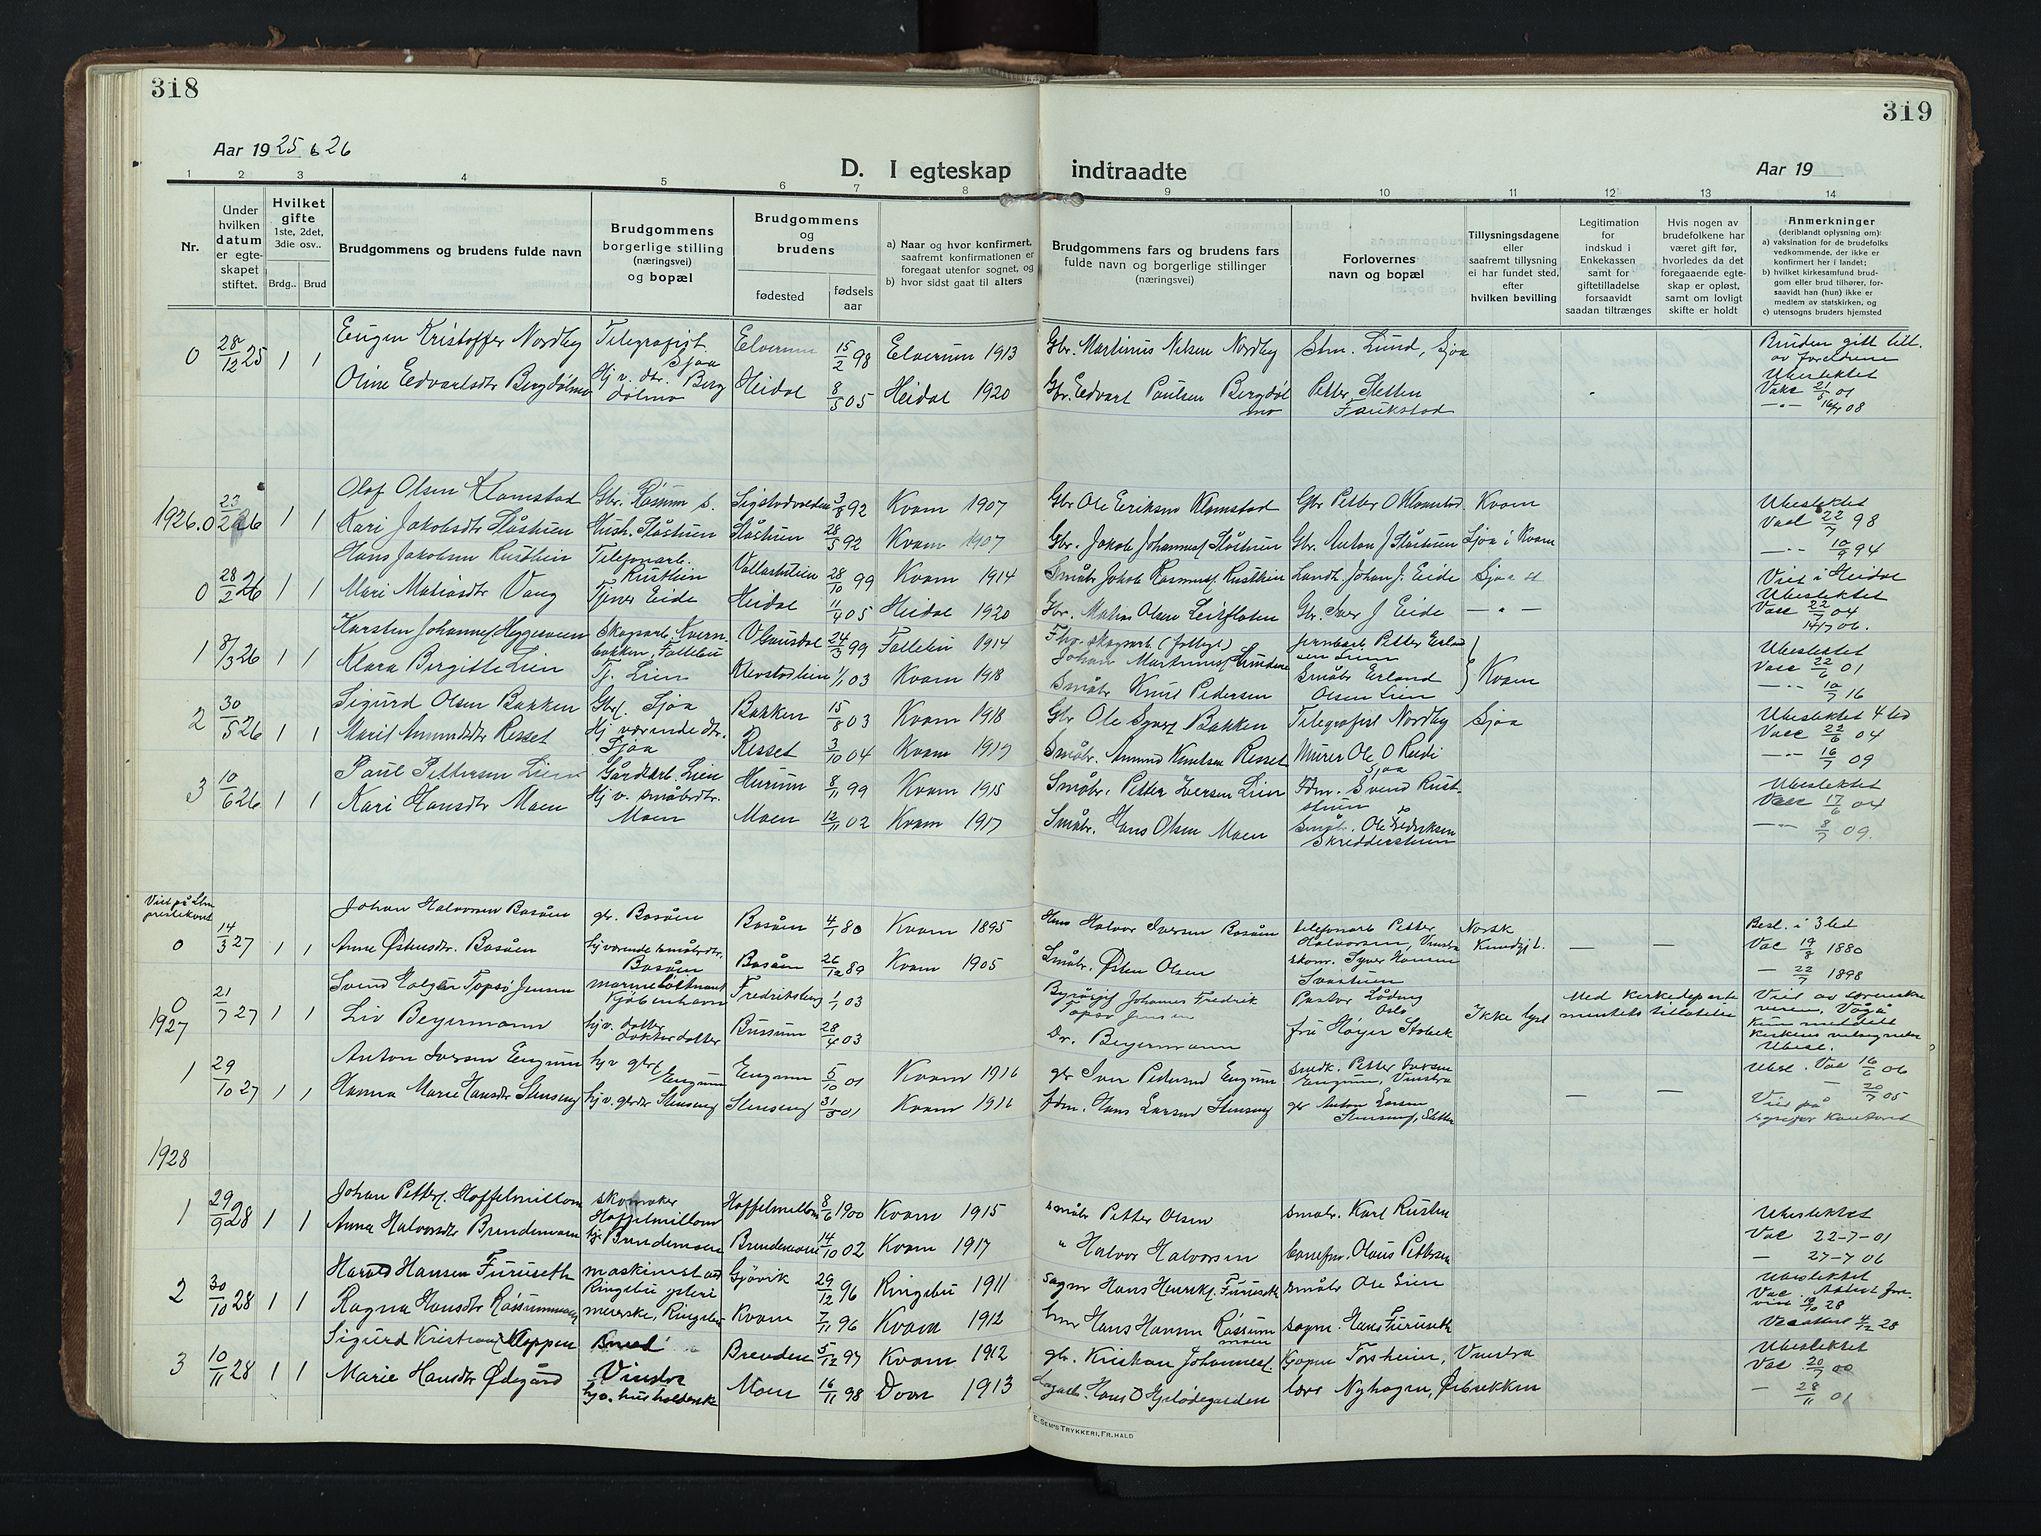 SAH, Nord-Fron prestekontor, Klokkerbok nr. 8, 1915-1948, s. 318-319